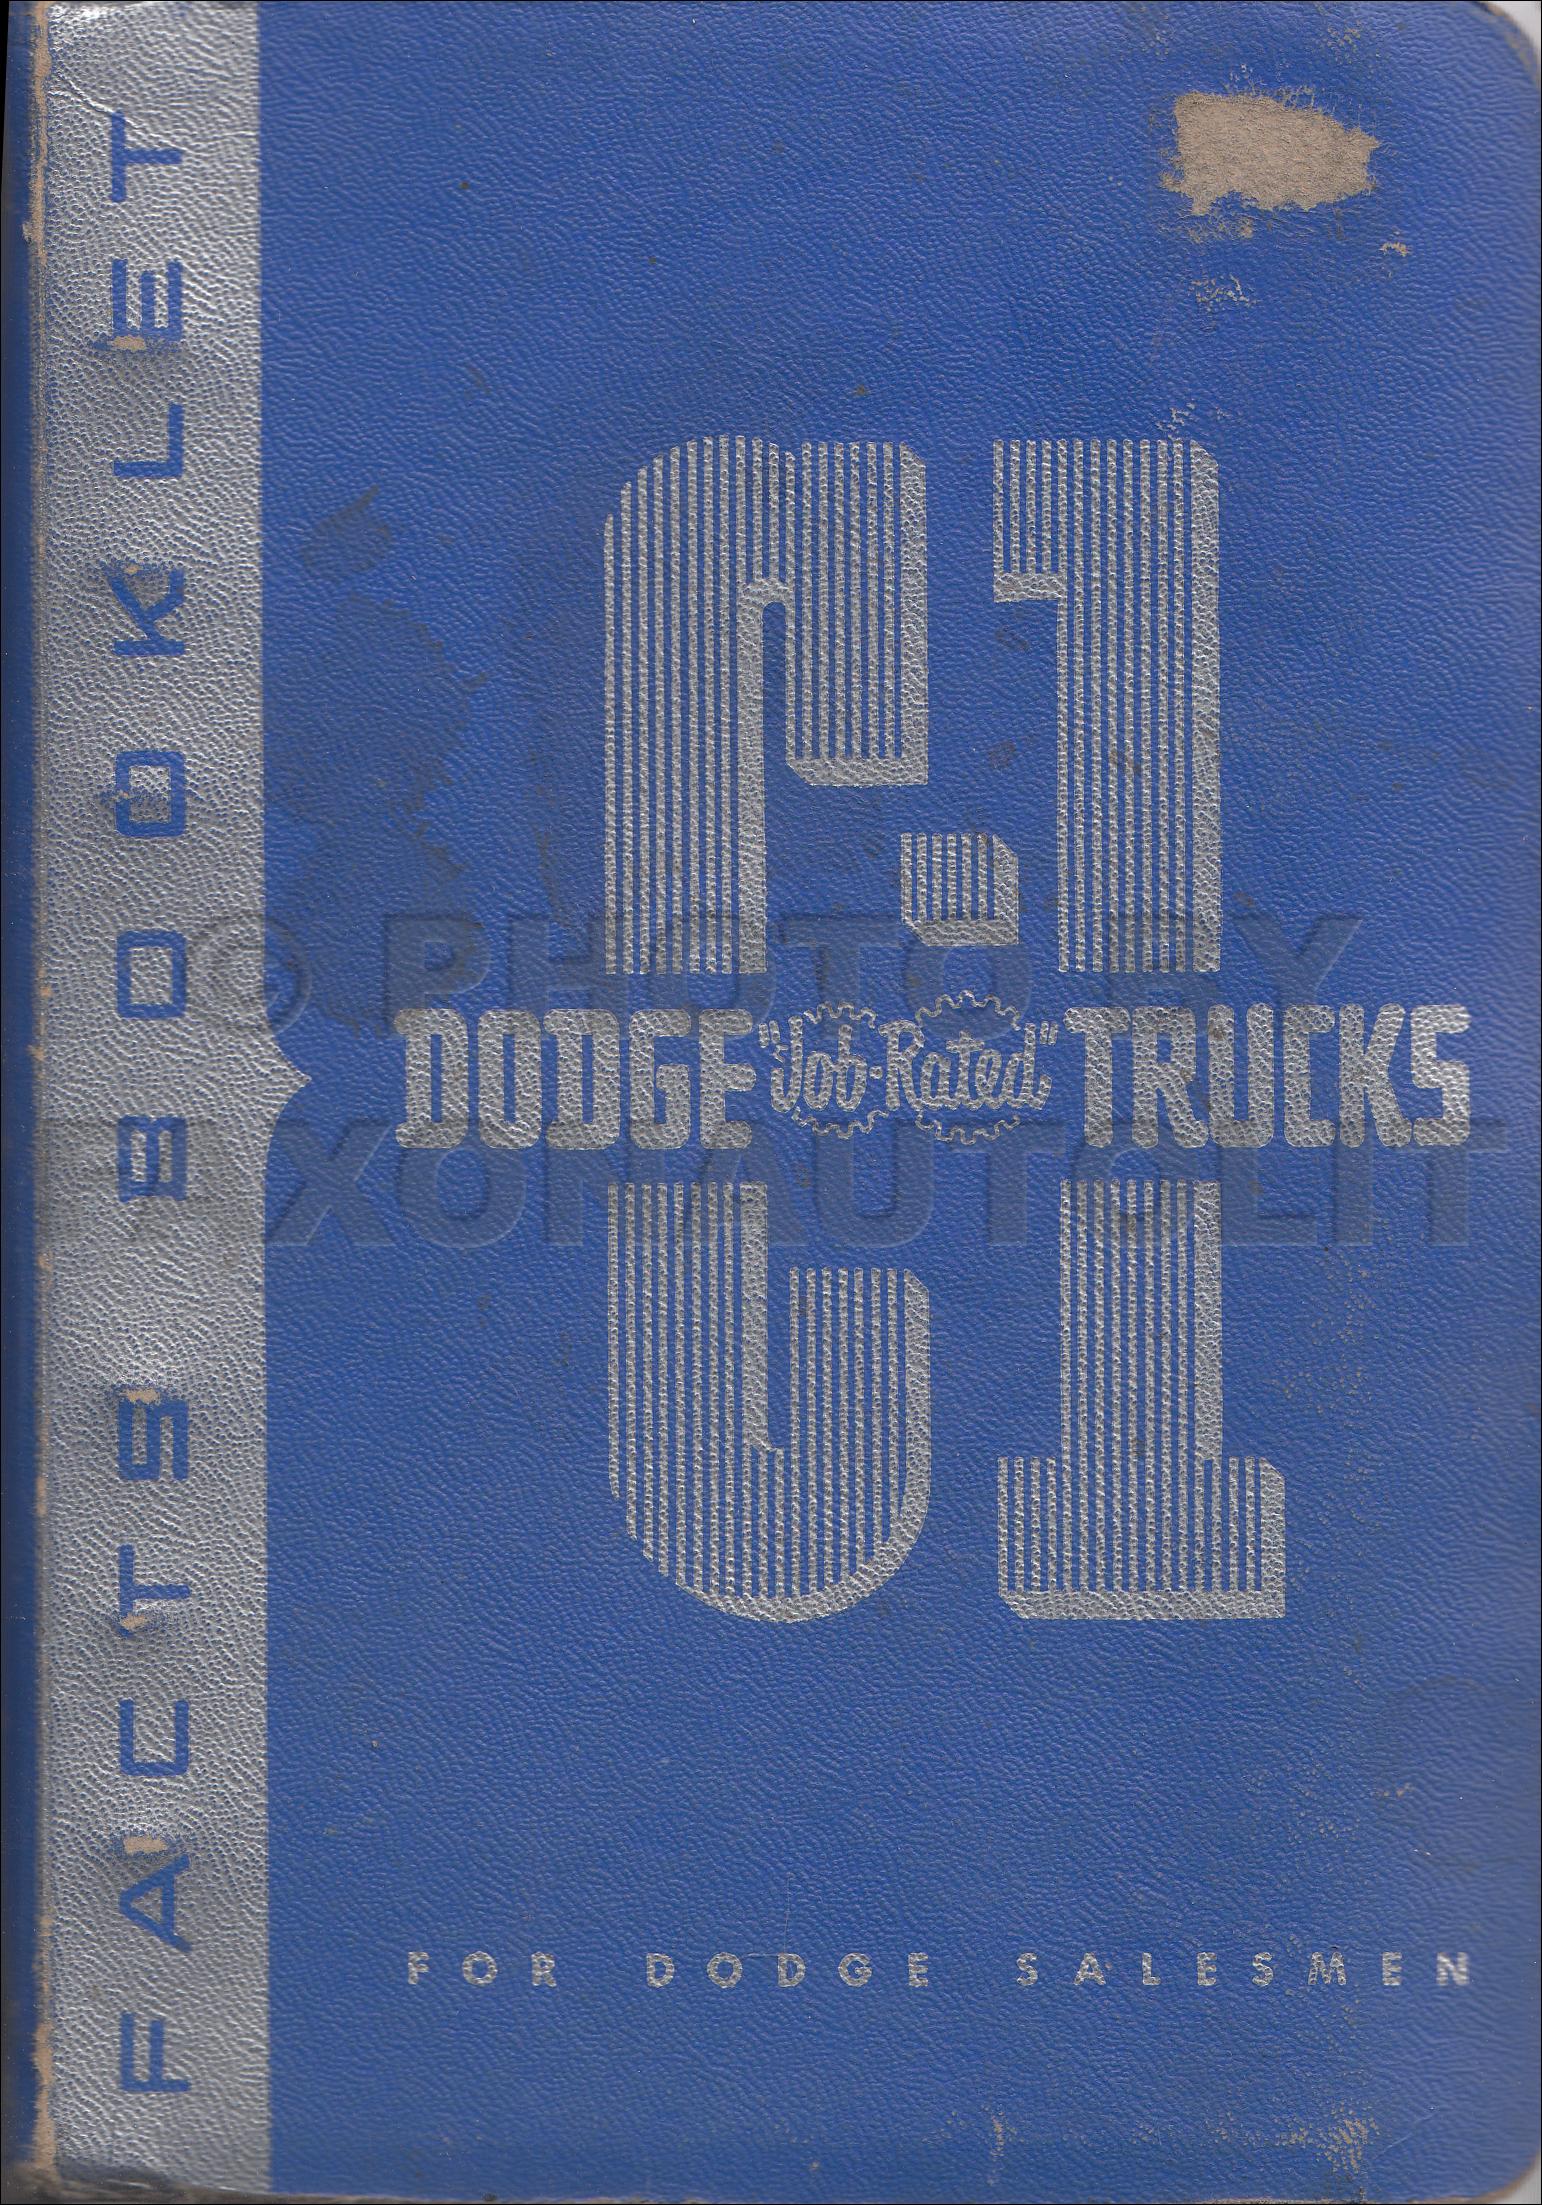 1954-1955 Dodge C-1 Truck Data Book Original